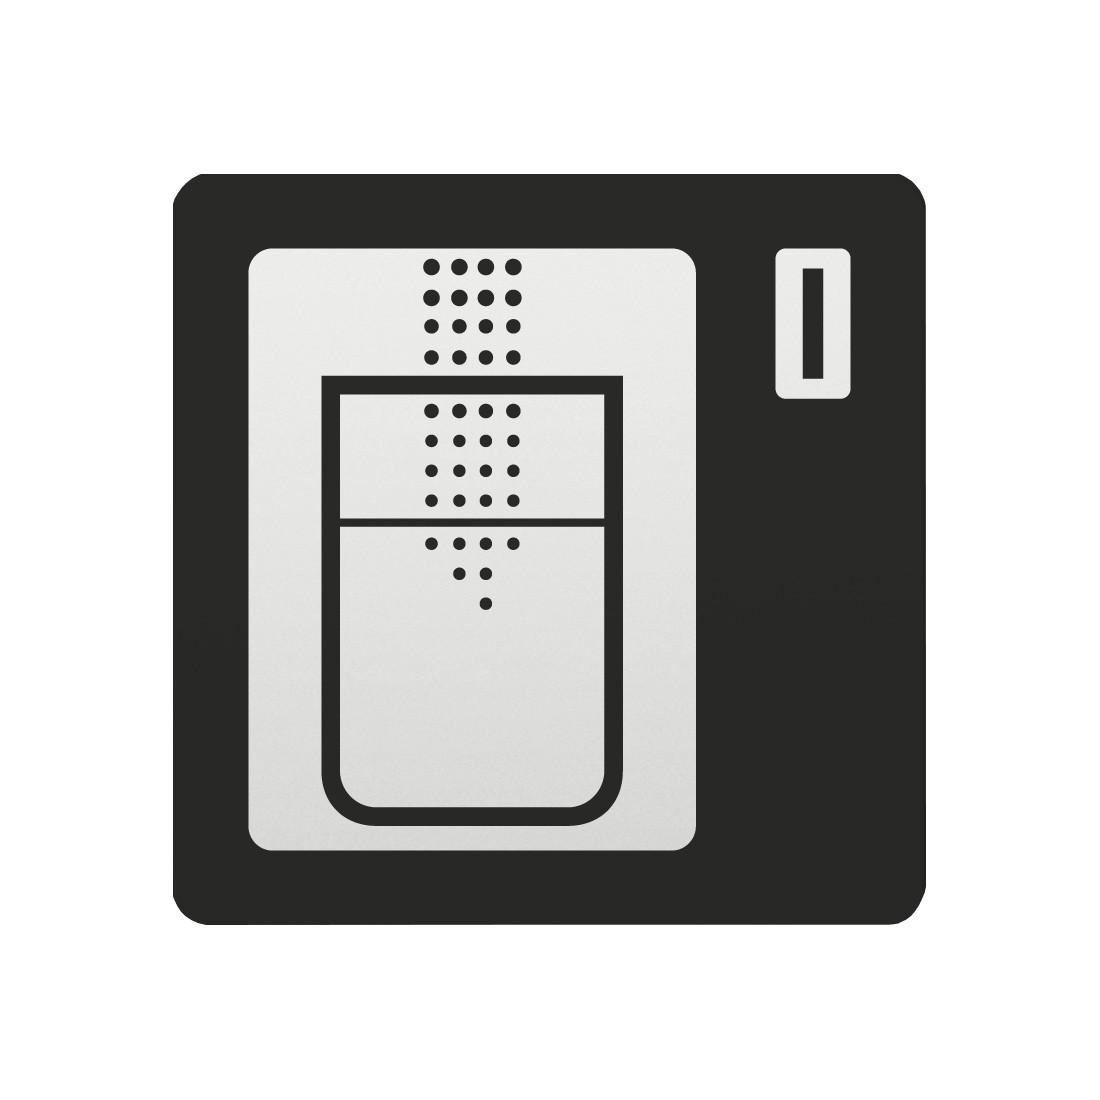 FSB Hinweiszeichen Getraenkeautomat Lasergraviert Aluminium naturfarbig (0 36 4059 00321 0105)